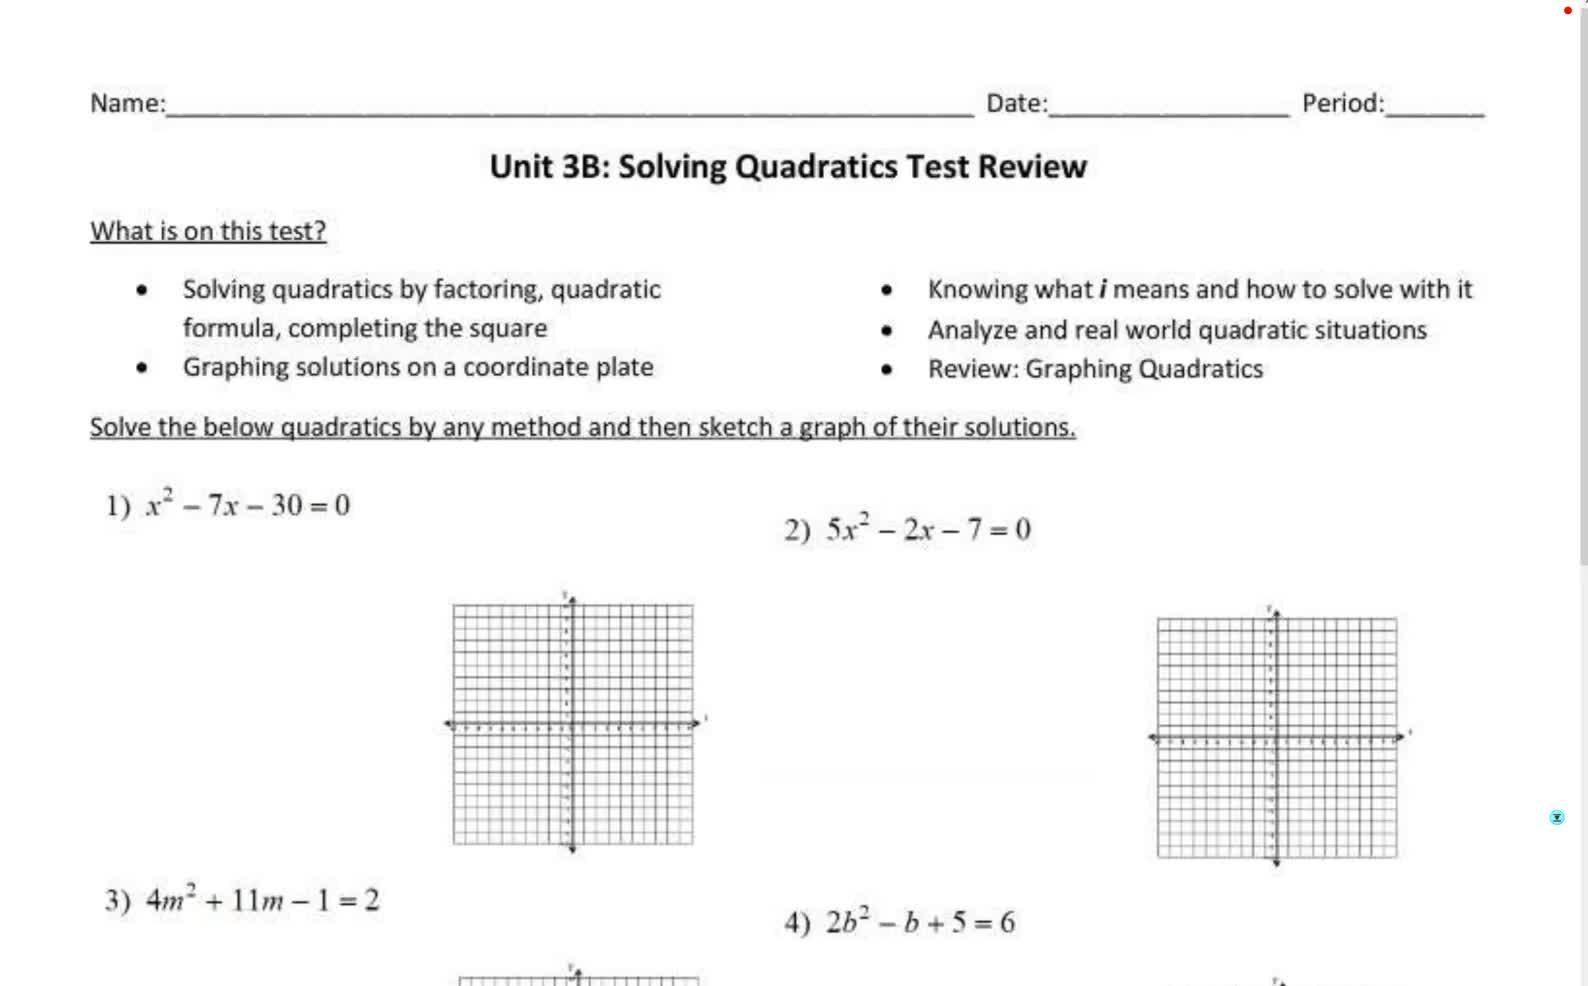 Senior Alg 2 Unit 3B Test Review